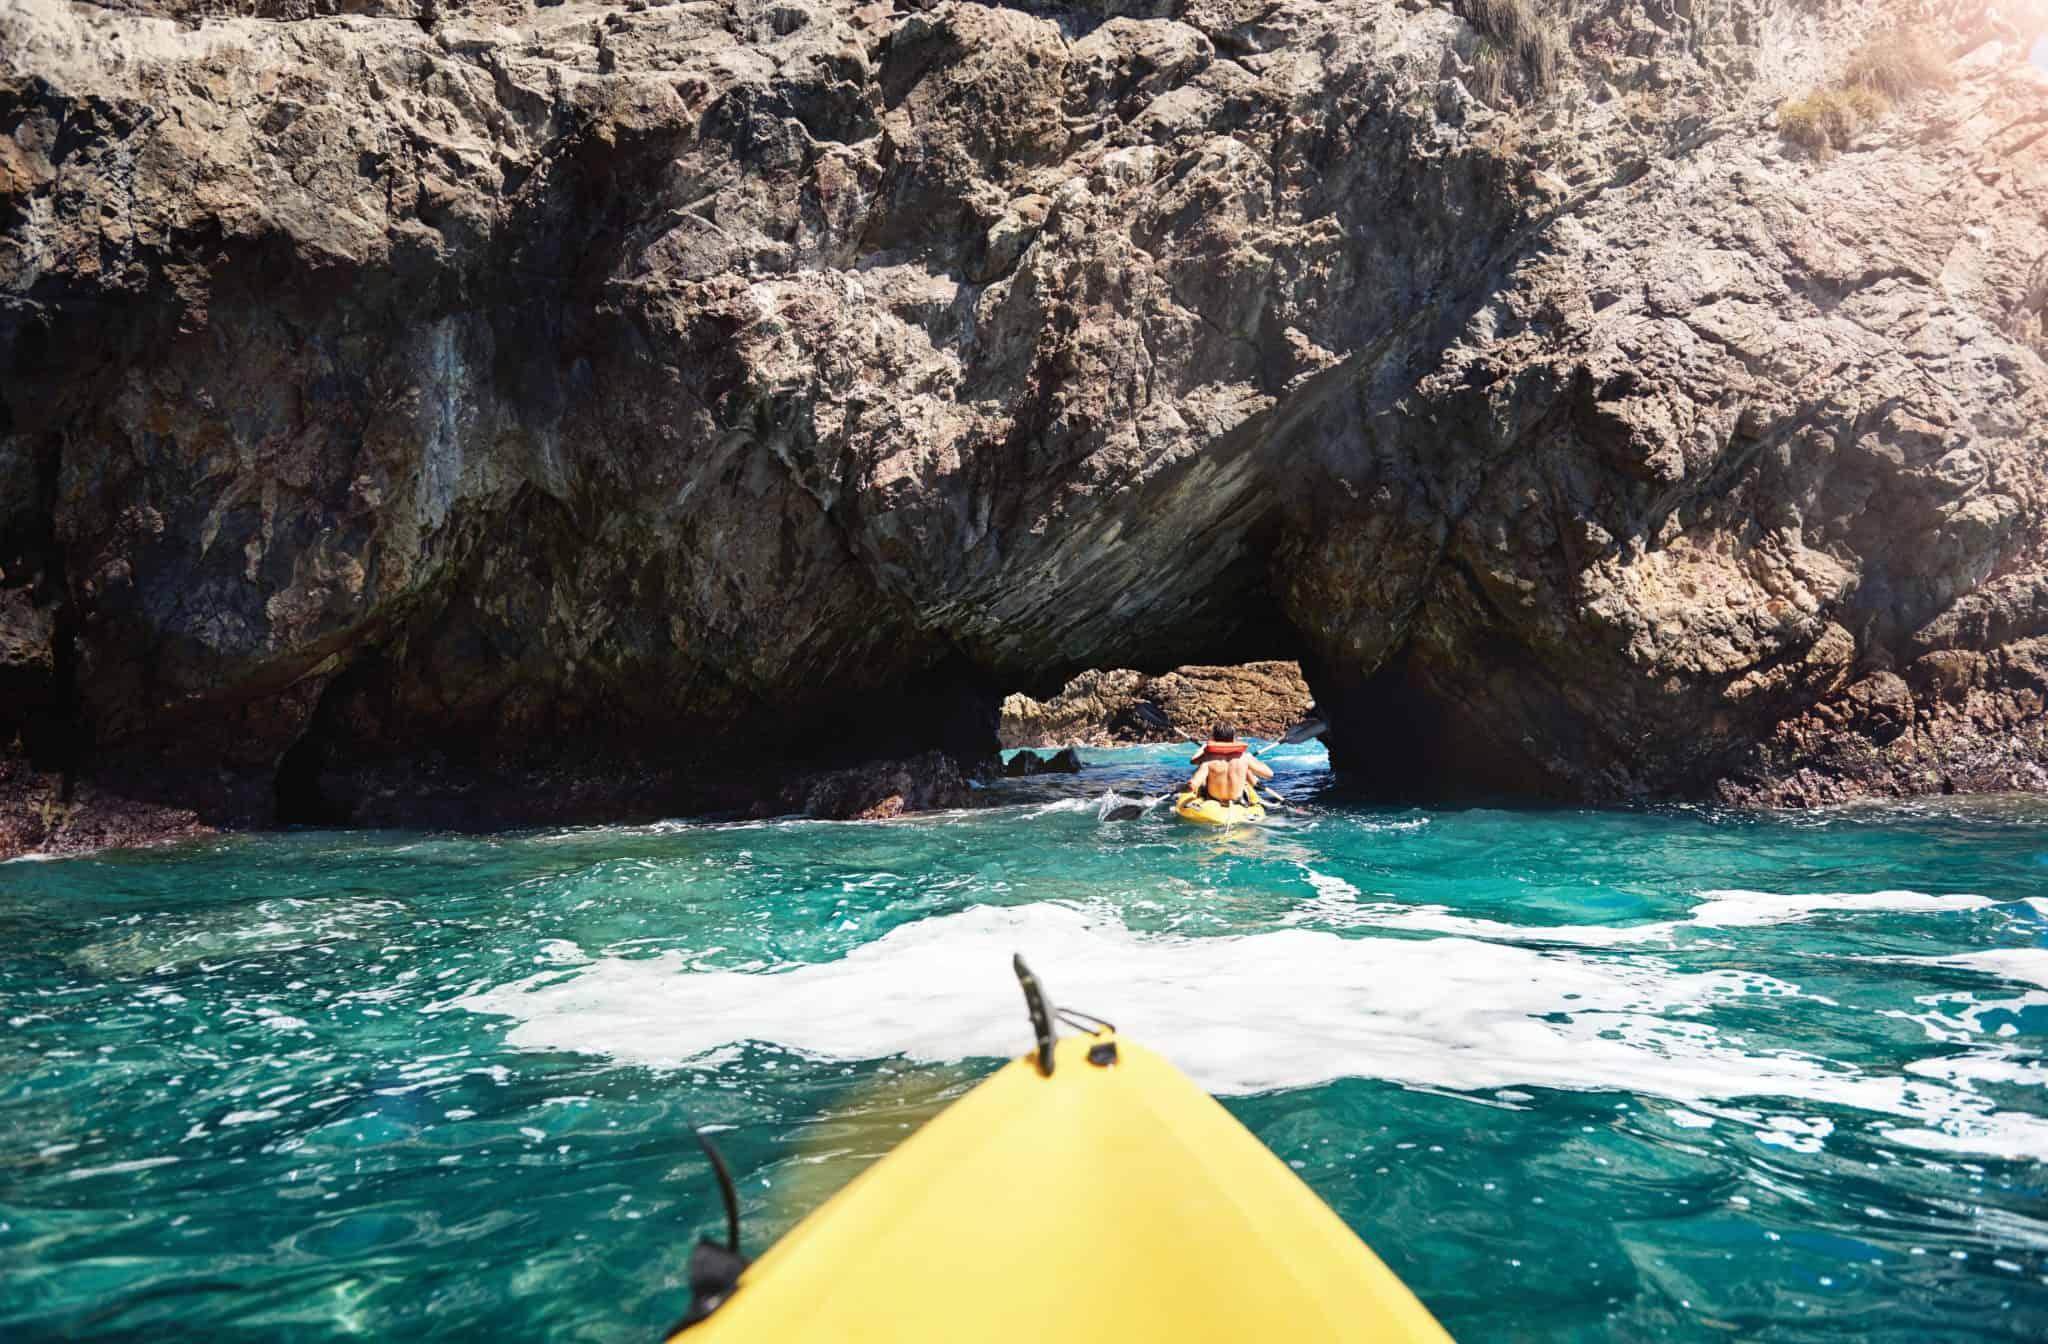 kayaking in mazatlán mazatlan mexico princess